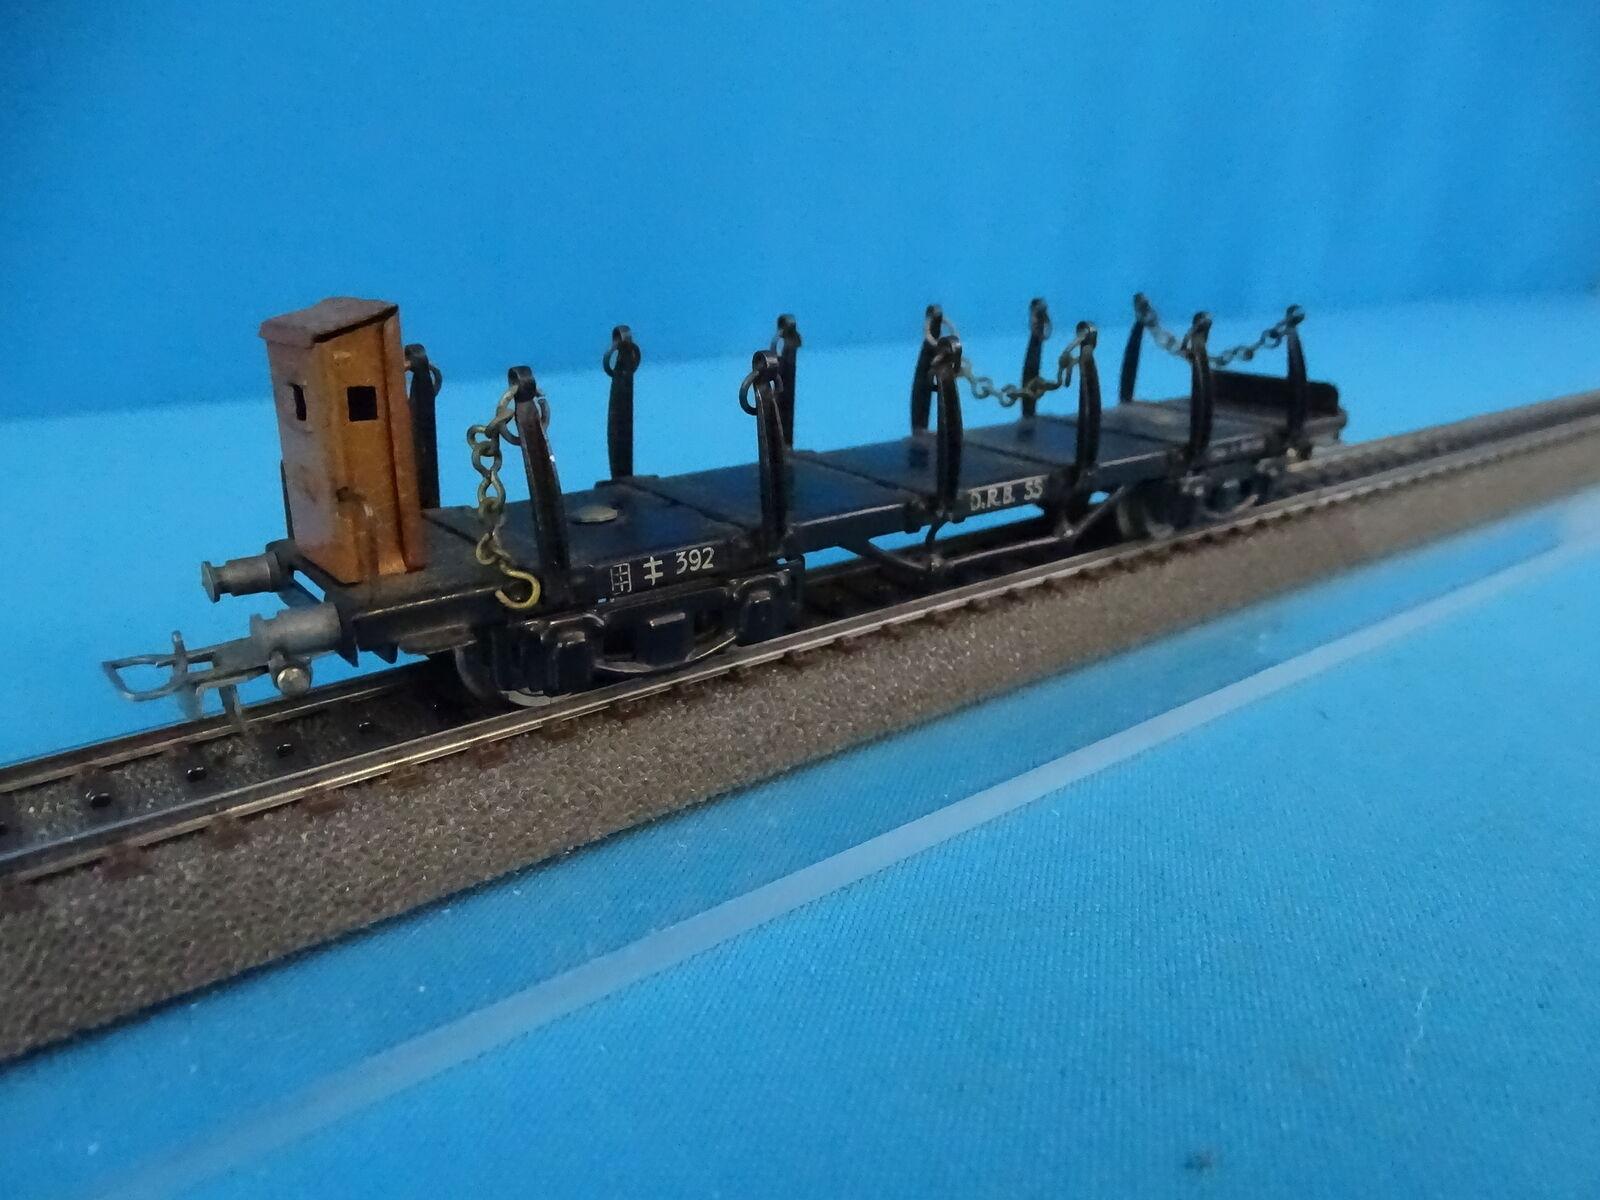 Marklin 392 Four axled Flat Coche Rungen wagen in OVP 1945